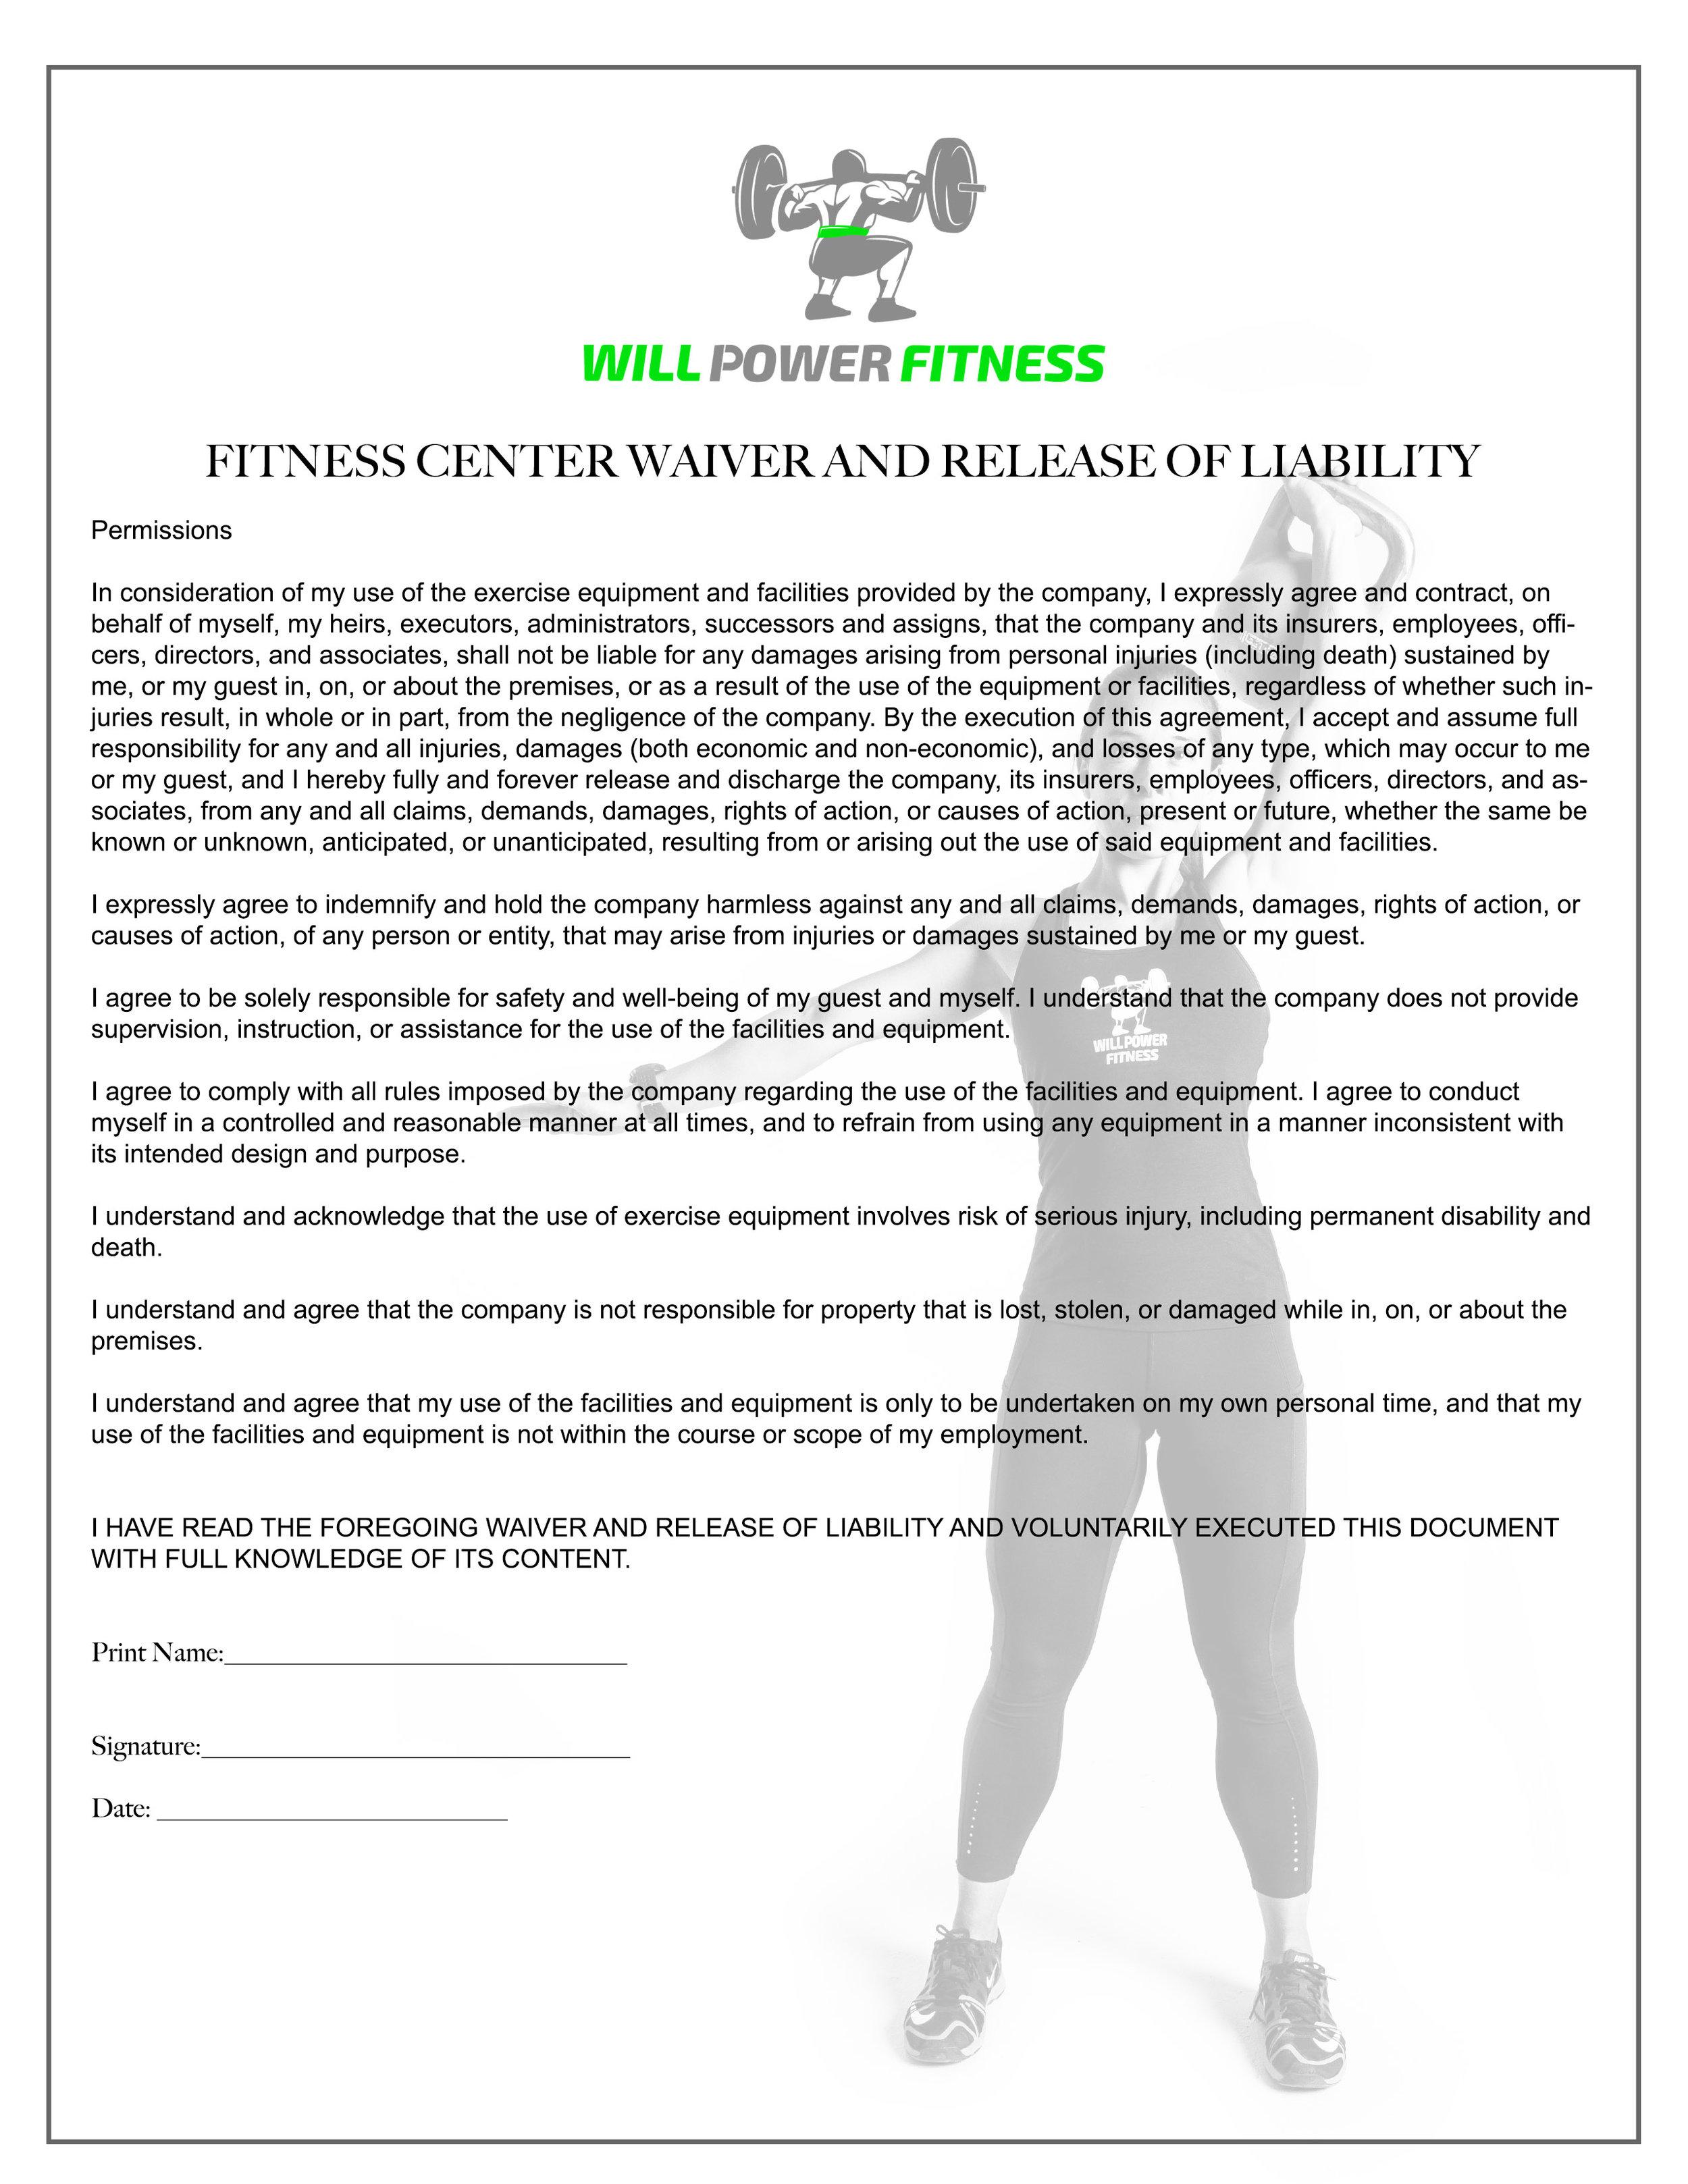 fitnesswaiver copy.jpg